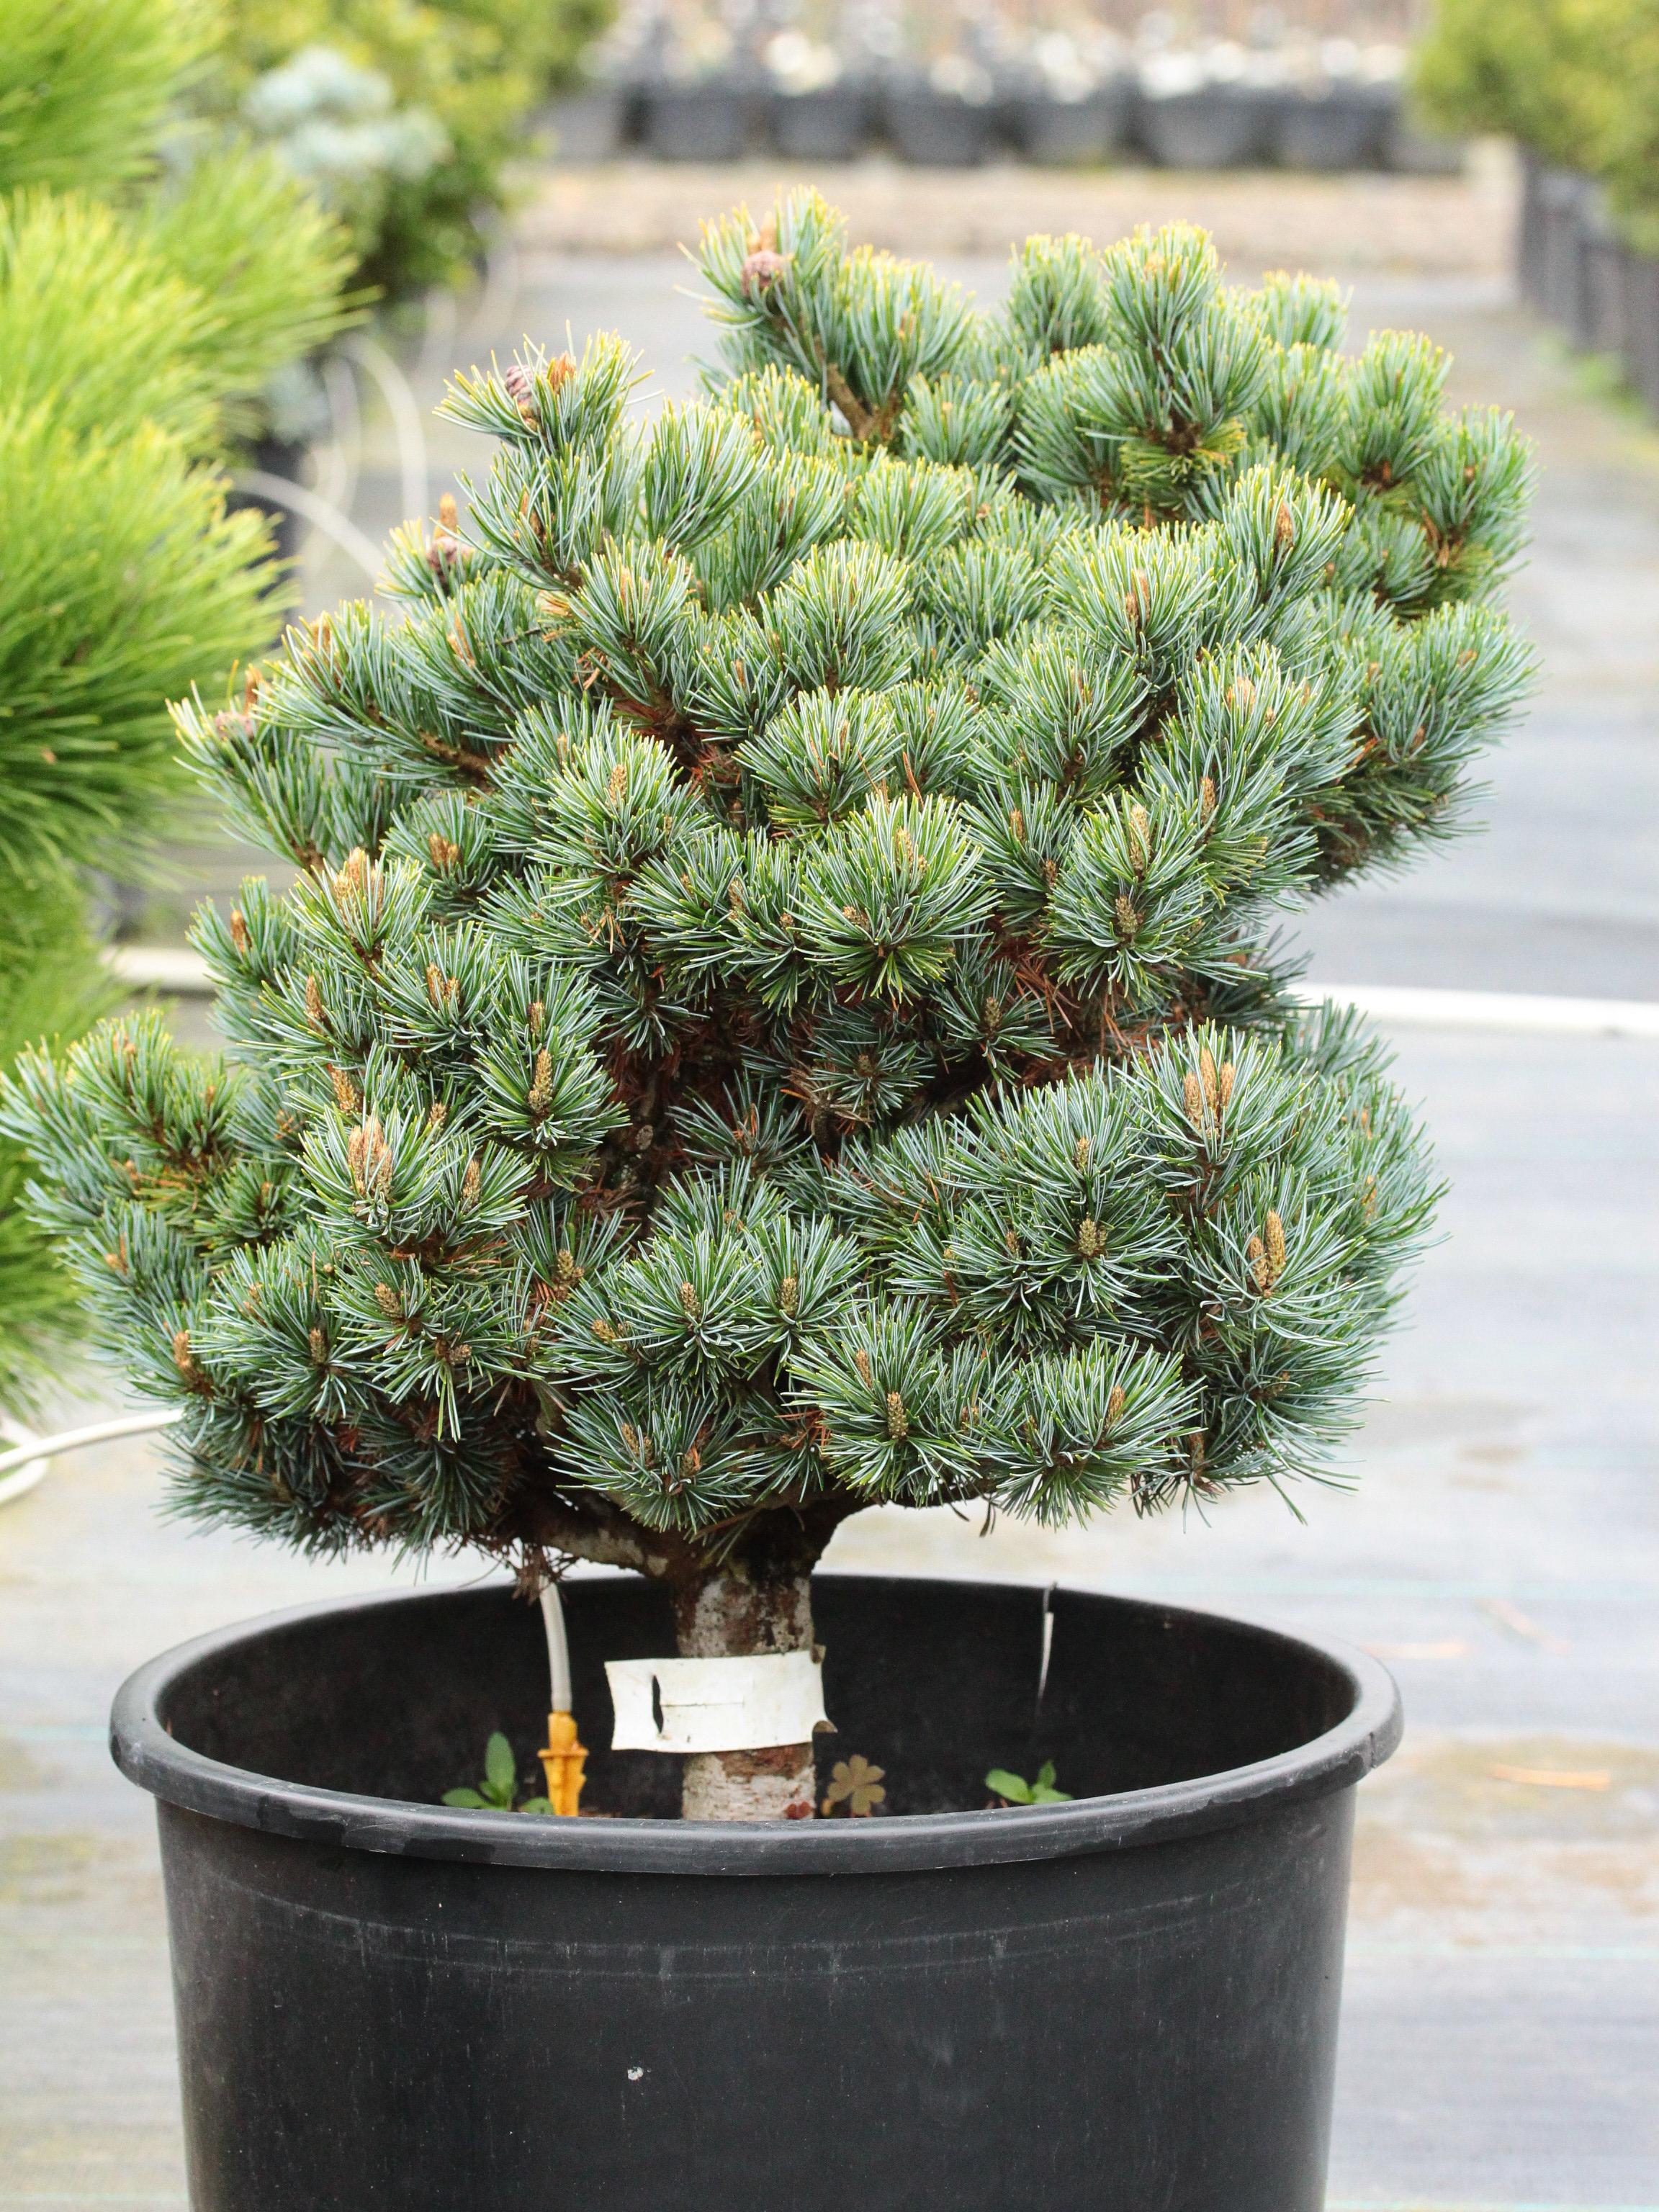 Pinus parviflora 'Regenhold' Ron's Broom Japanese White Pine